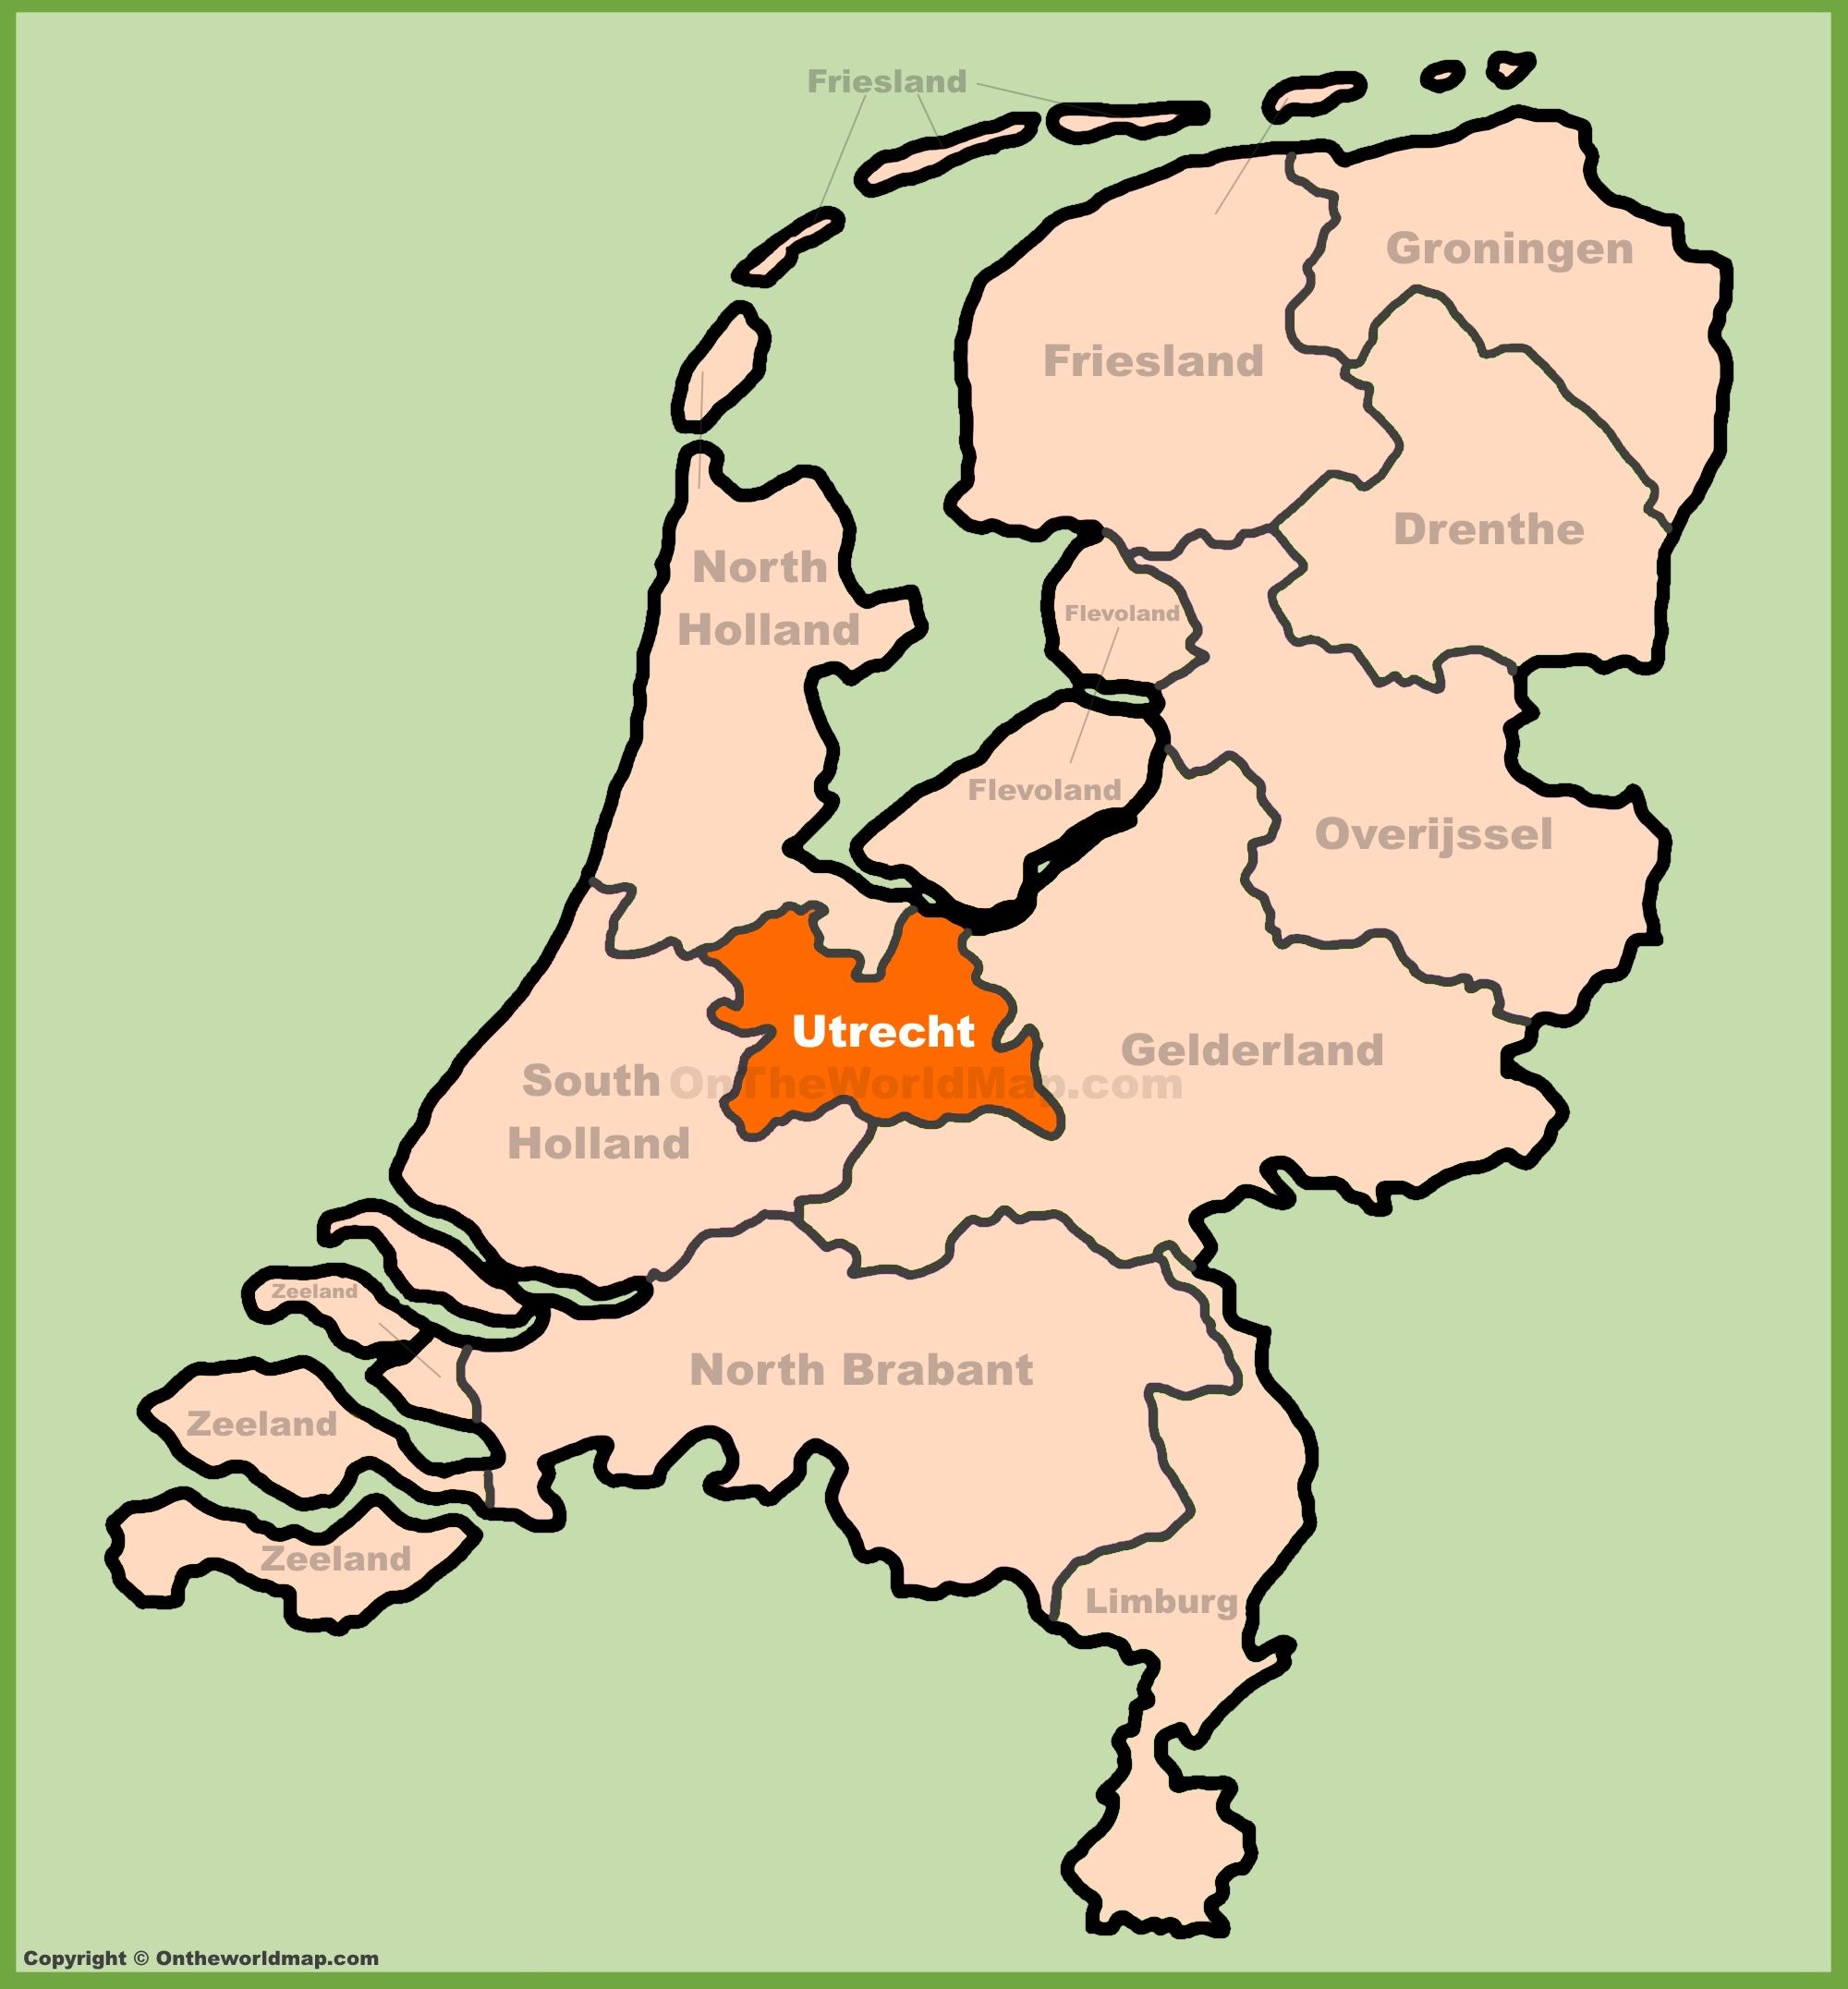 Utrecht province Maps Netherlands Maps of Utrecht province